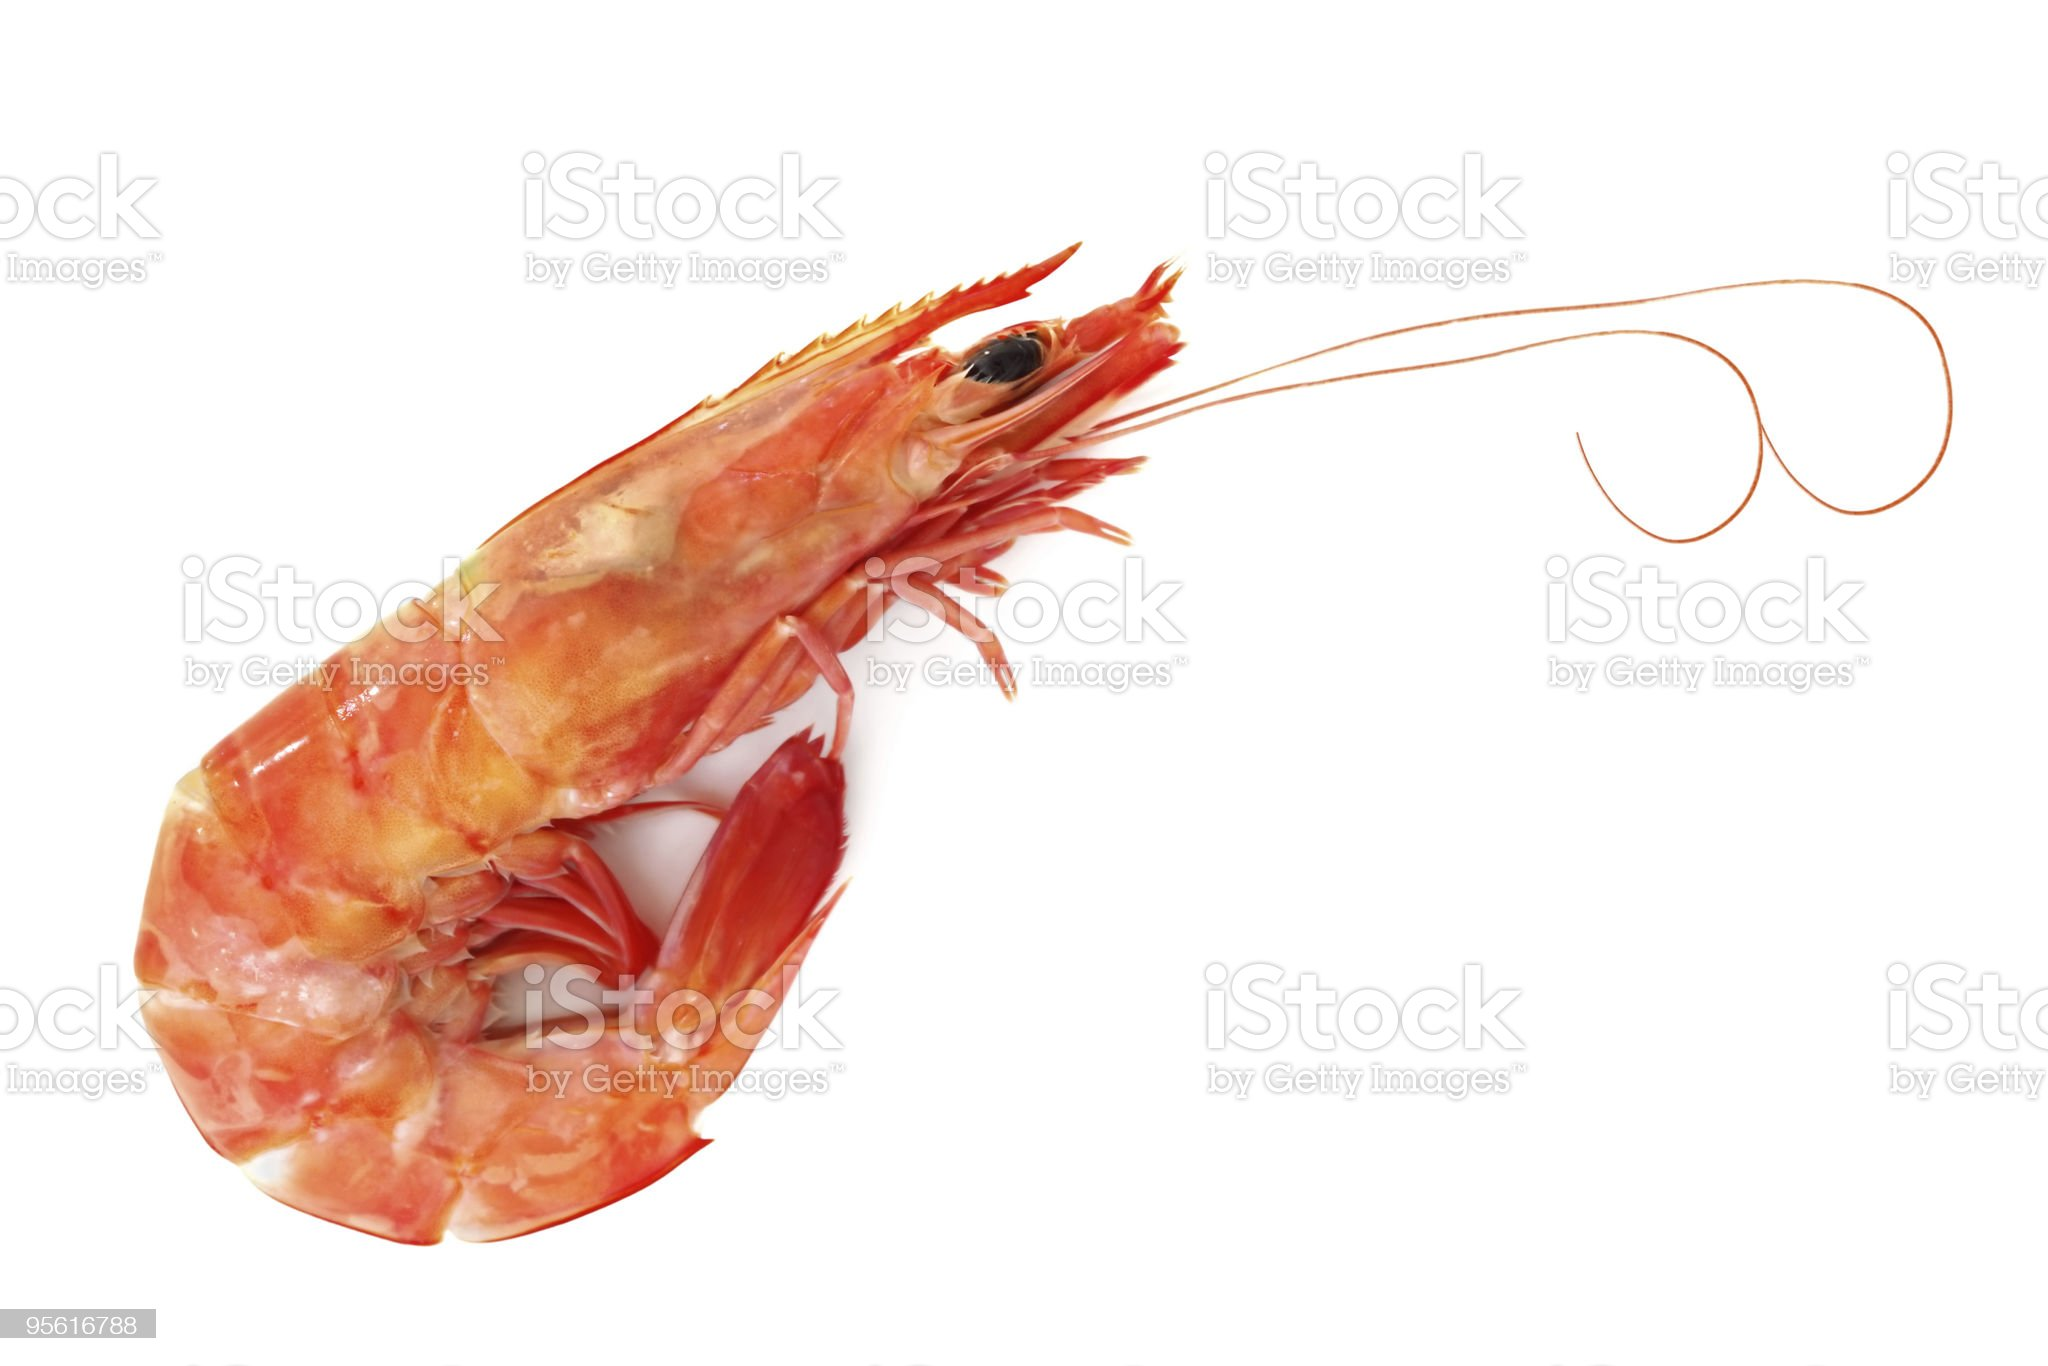 Single Shrimp royalty-free stock photo